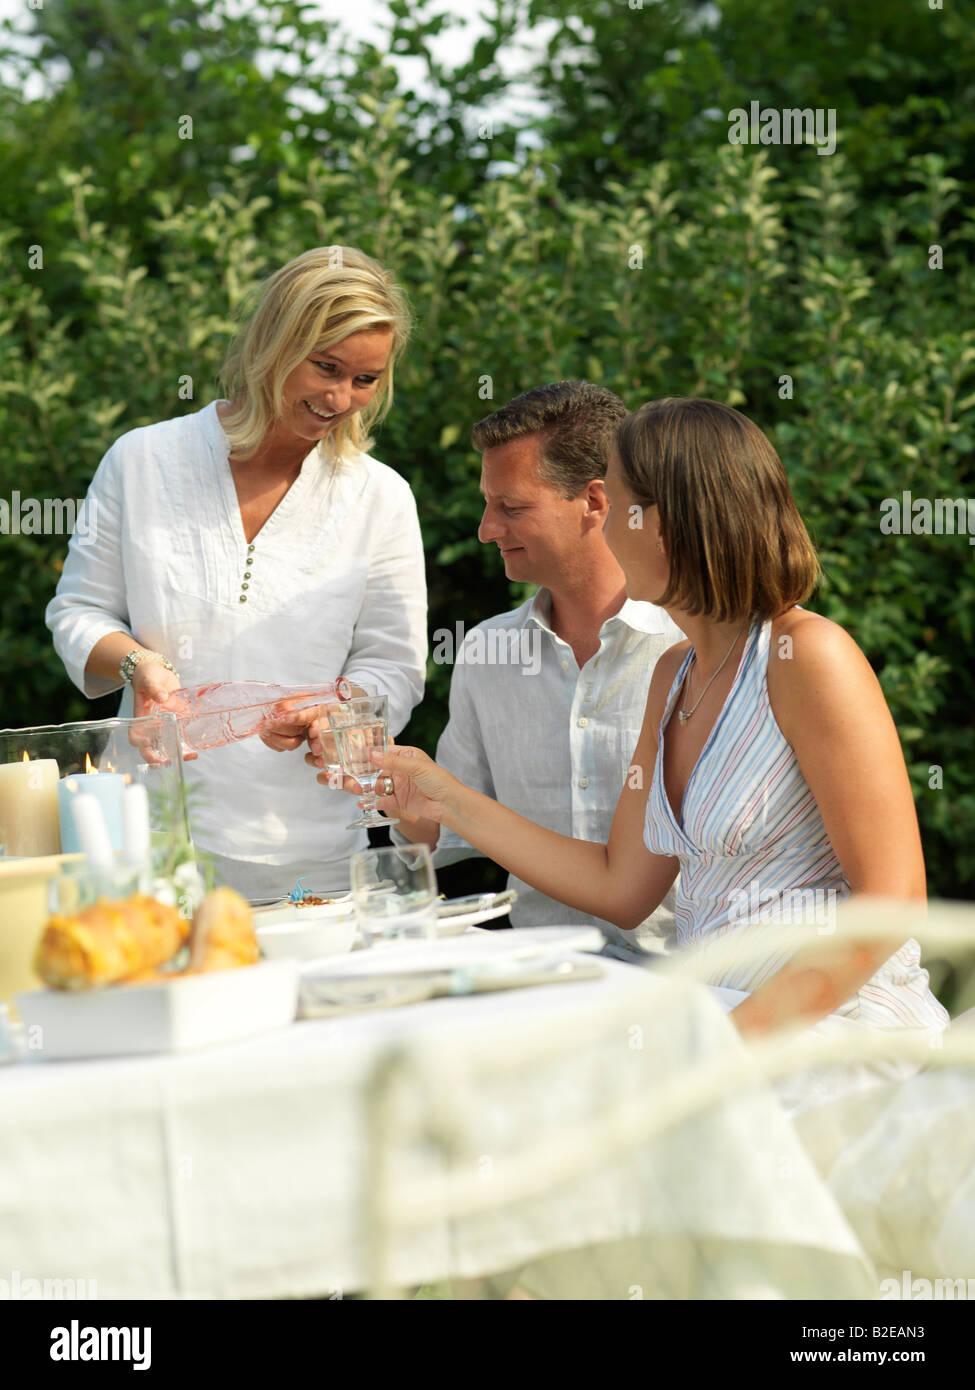 you hard Single Frauen Werneck kennenlernen criticising advise